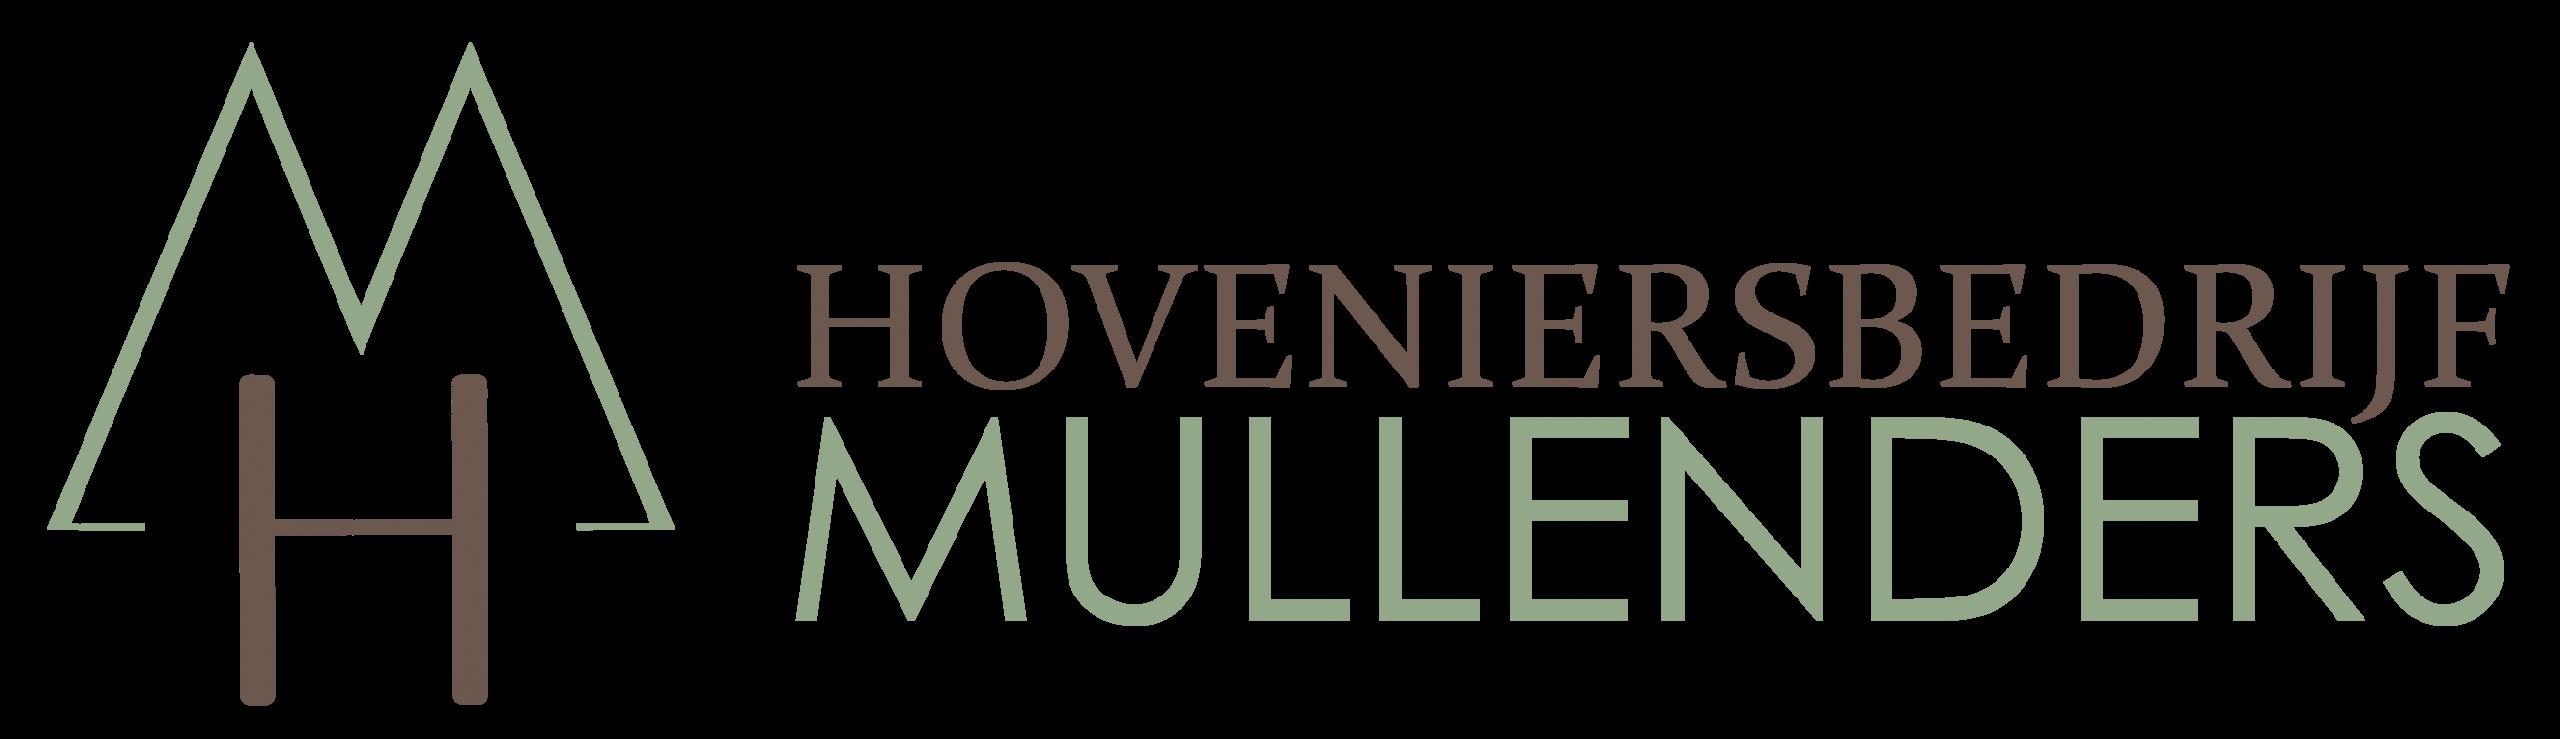 Mullenders Hoveniers